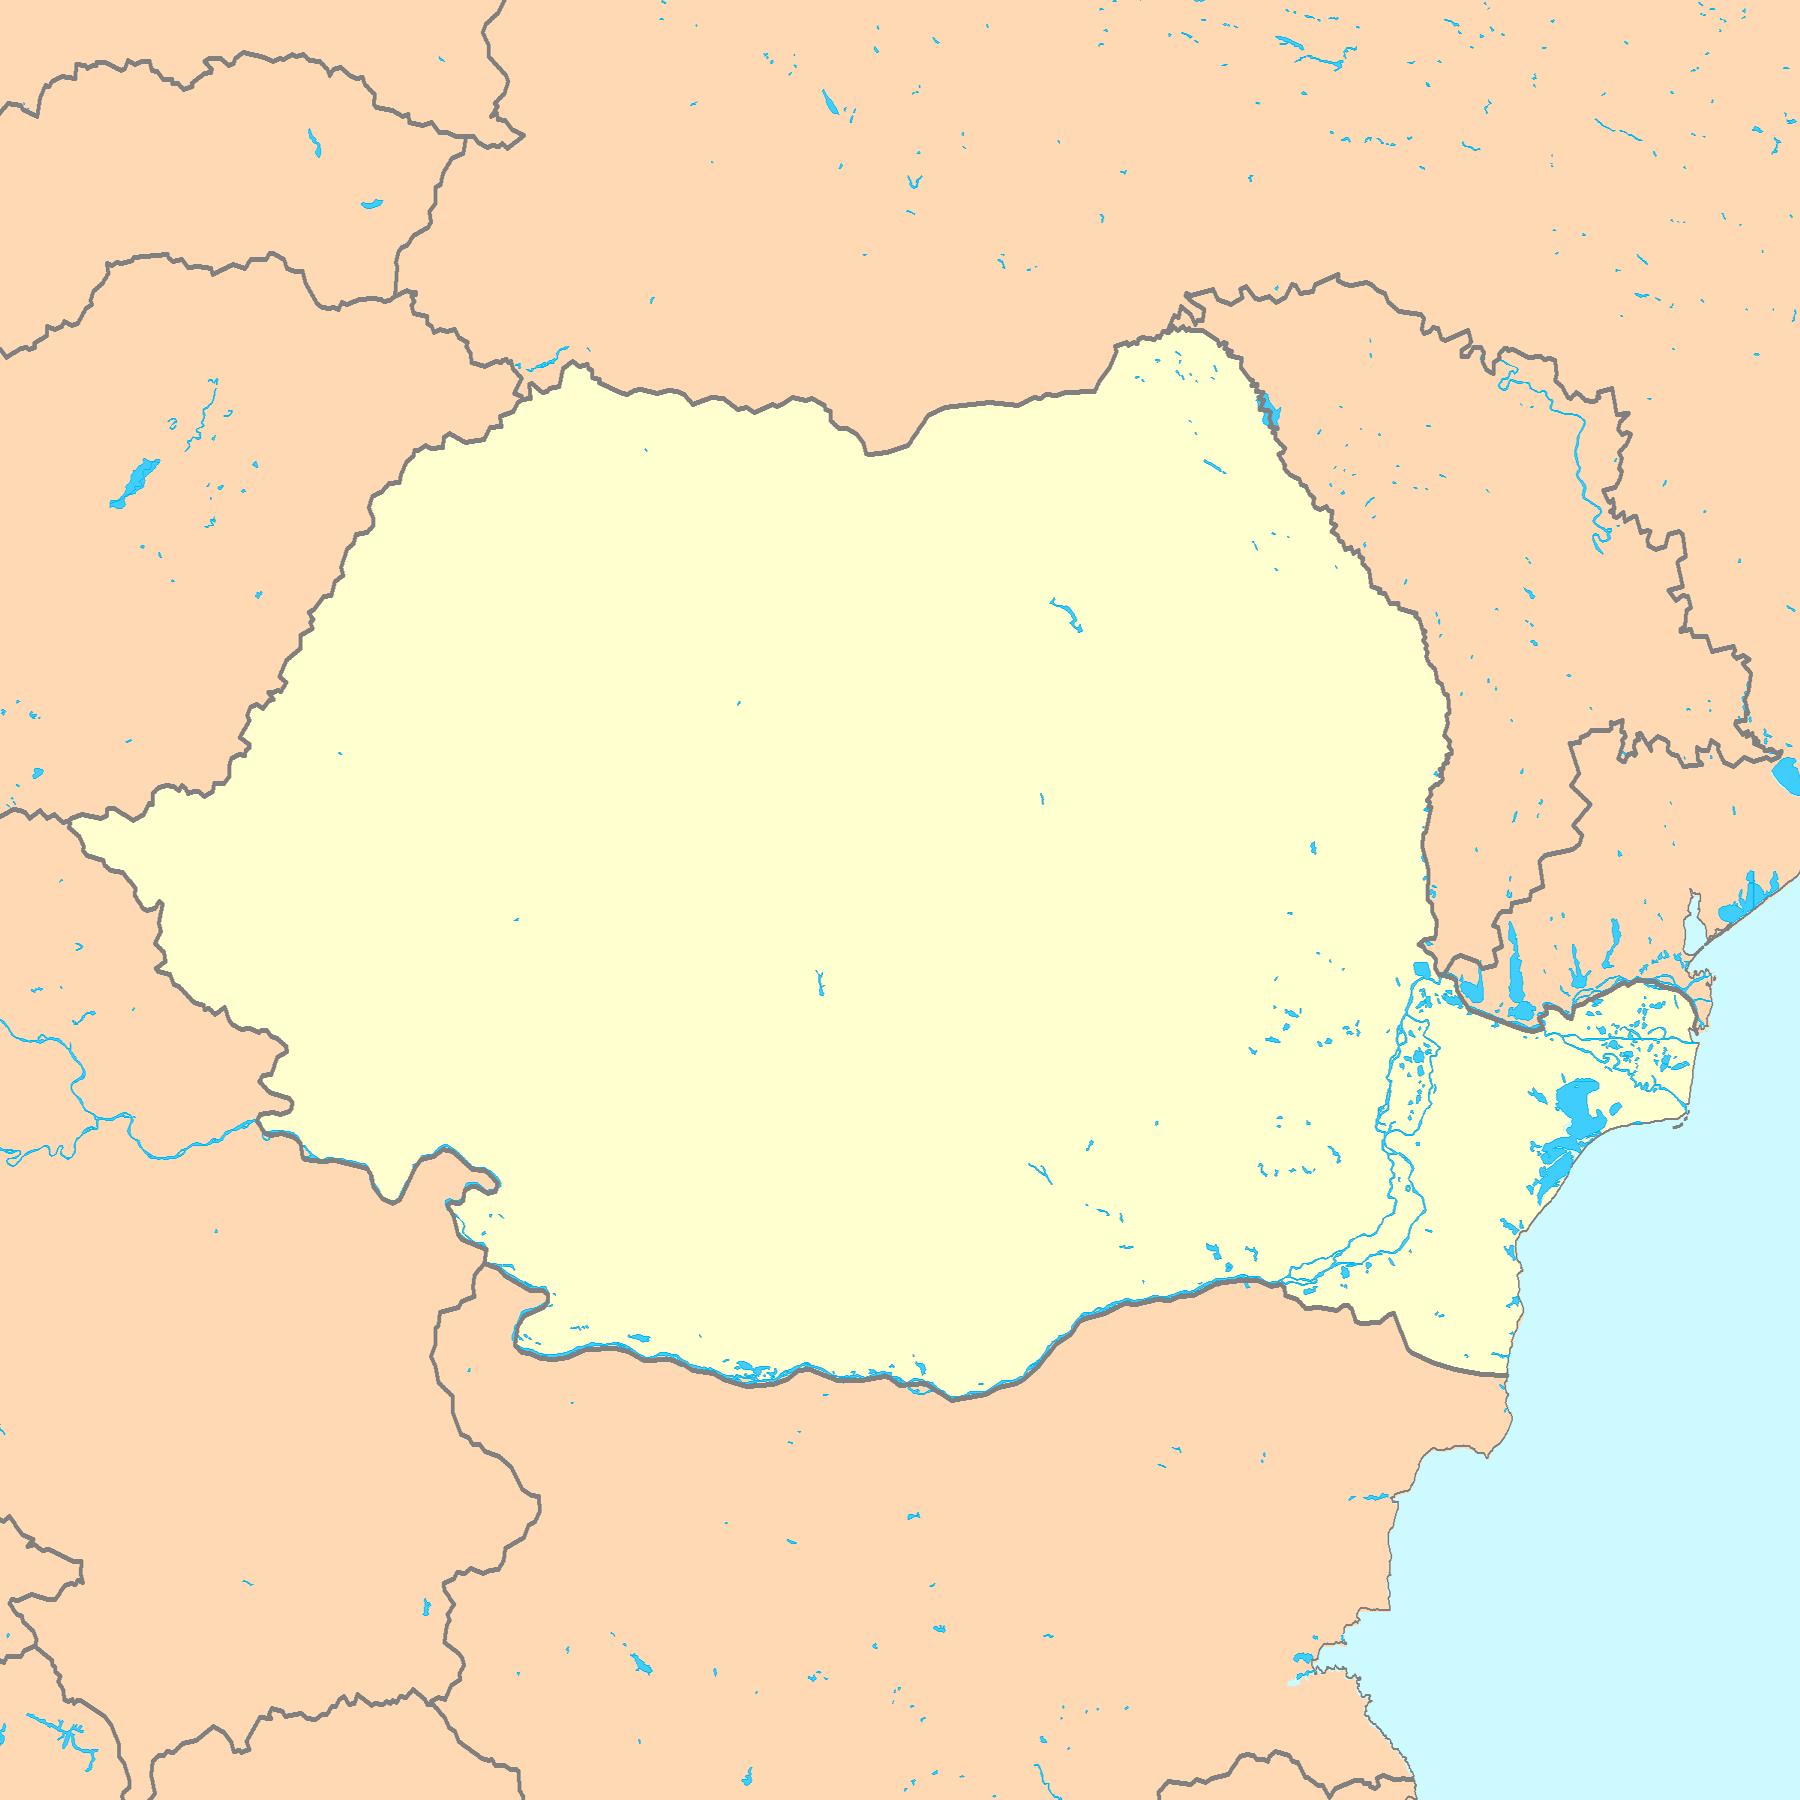 FileRomania Map Blankpng Wikimedia Commons - Romania map